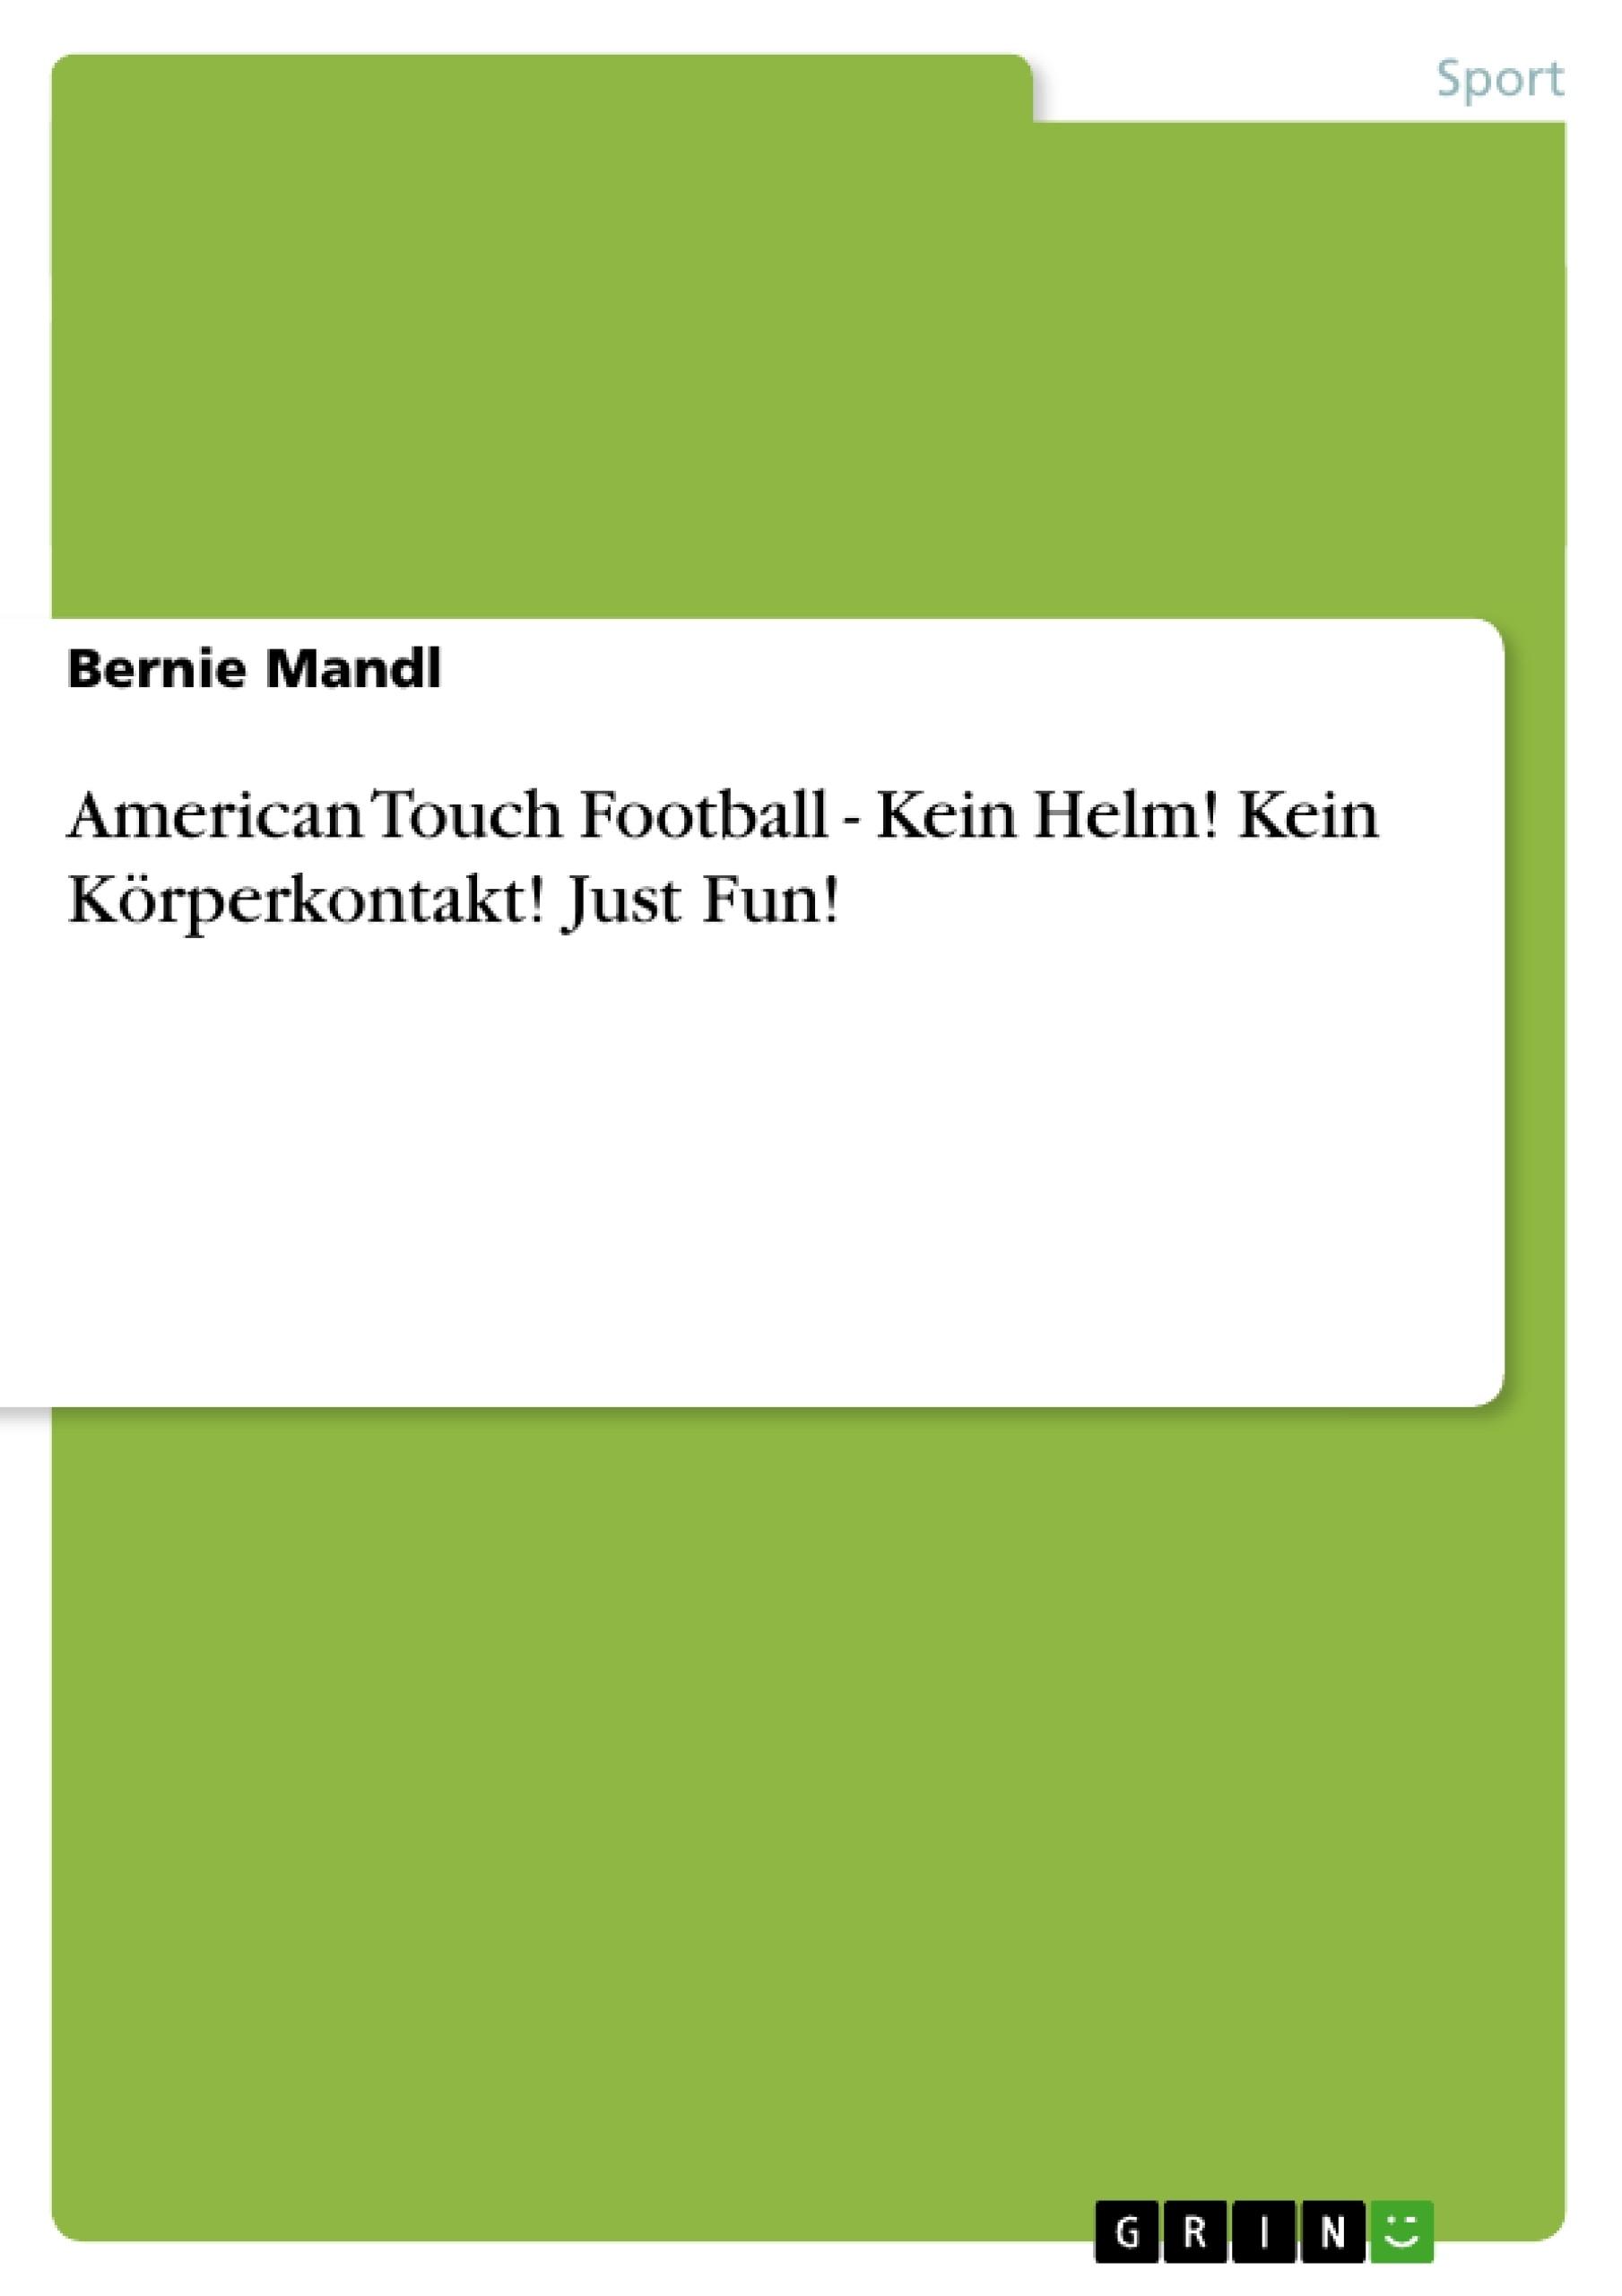 Titel: American Touch Football - Kein Helm! Kein Körperkontakt! Just Fun!